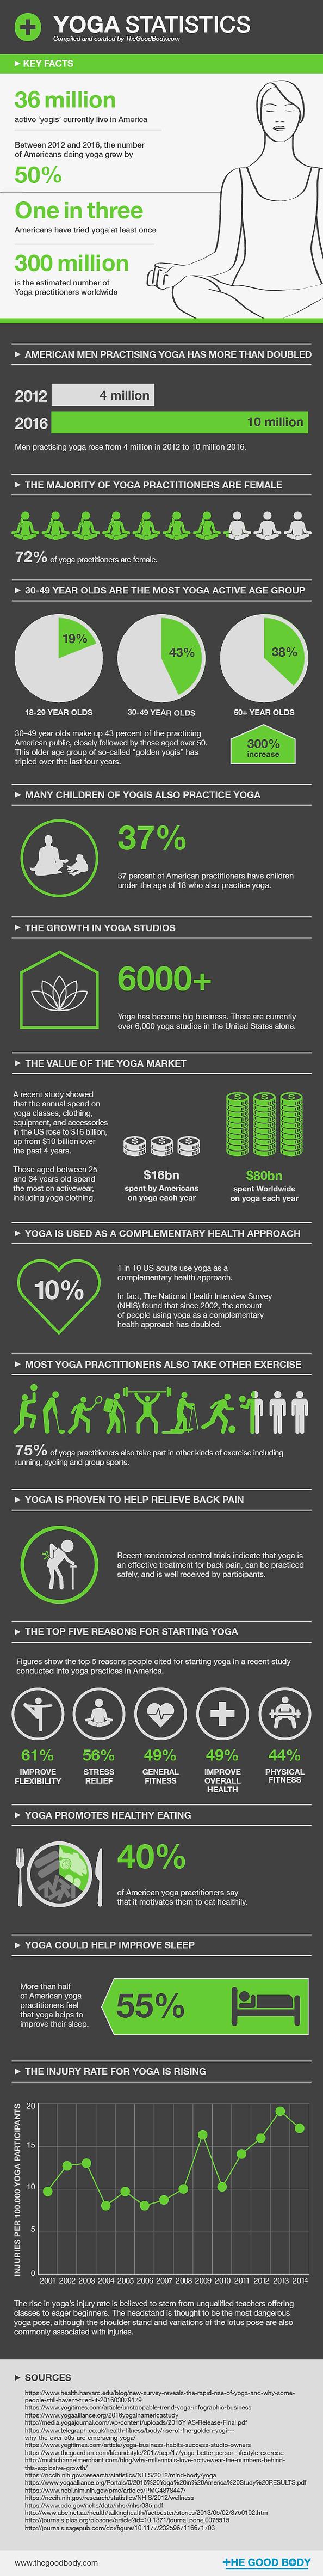 yoga-statistics-infographic.png